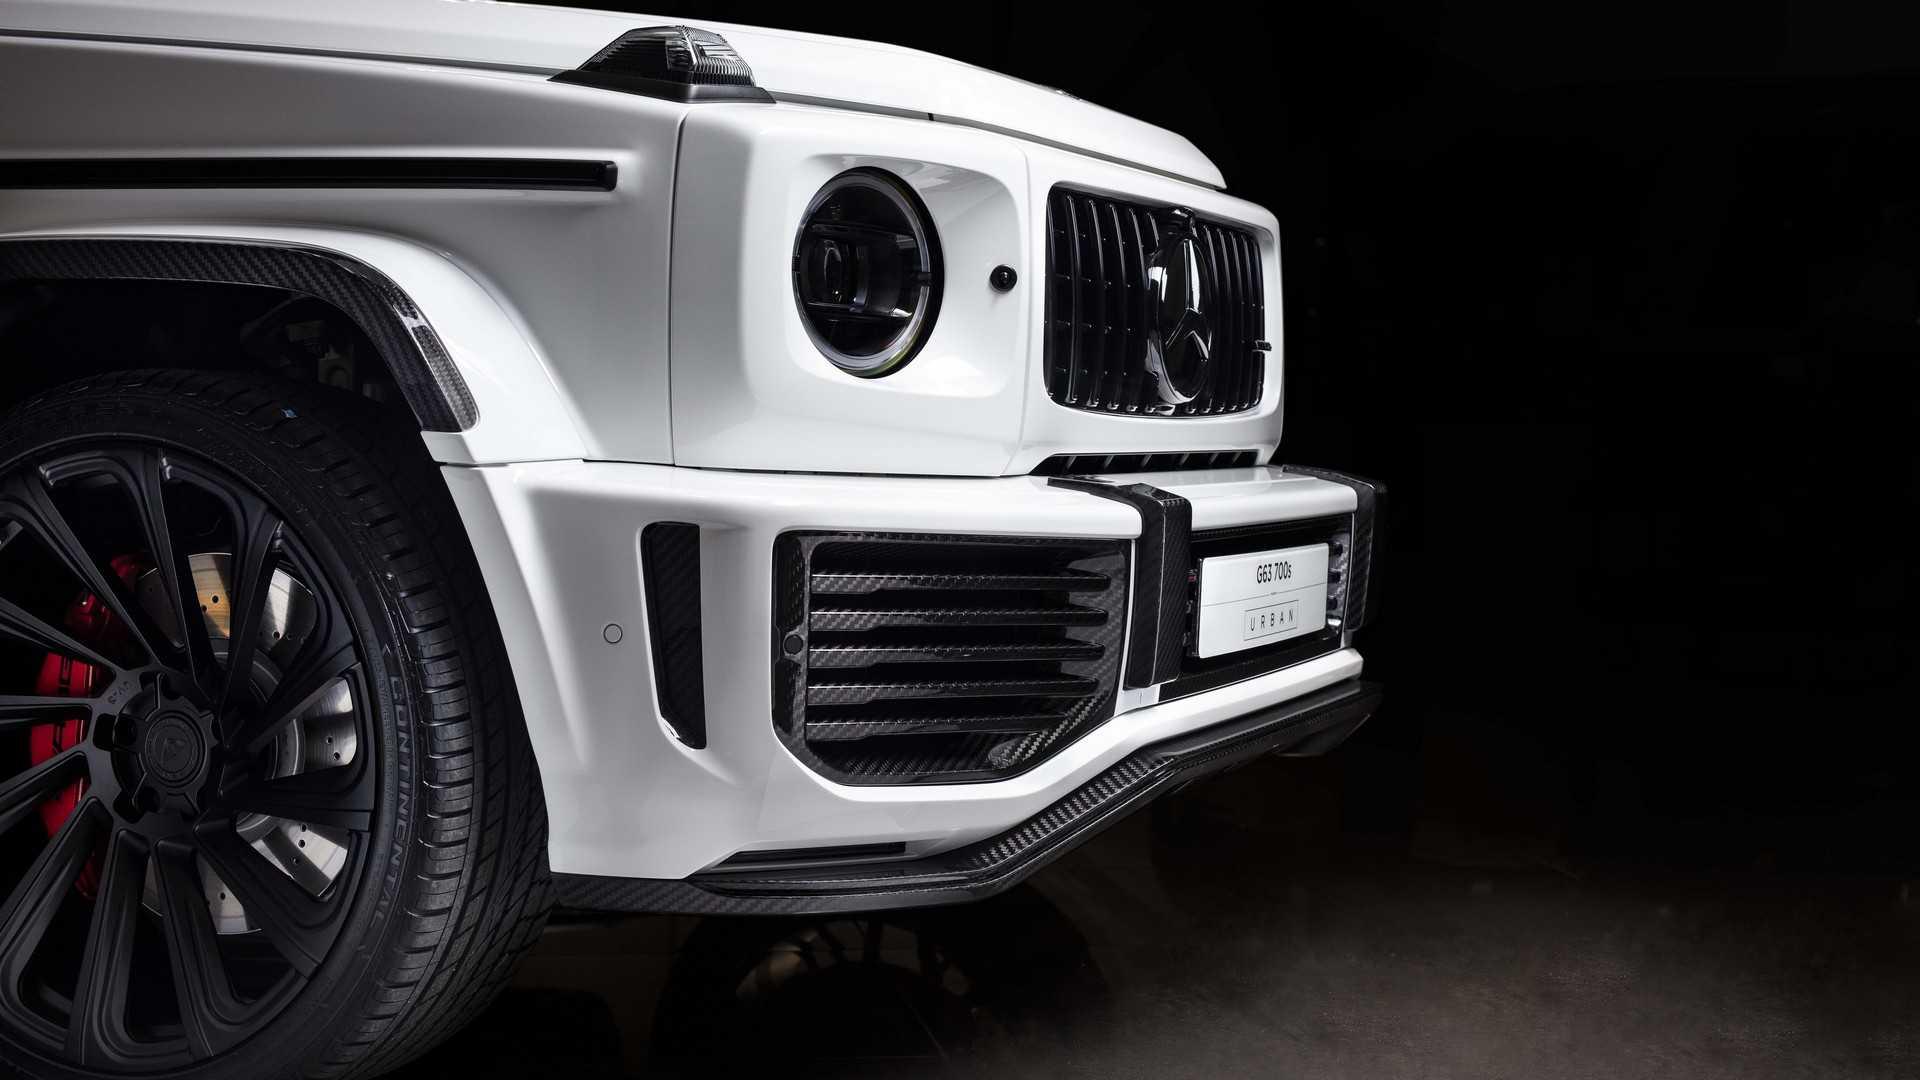 2019-mercedes-amg-g63-widebody-by-urban-automotive-2.jpg